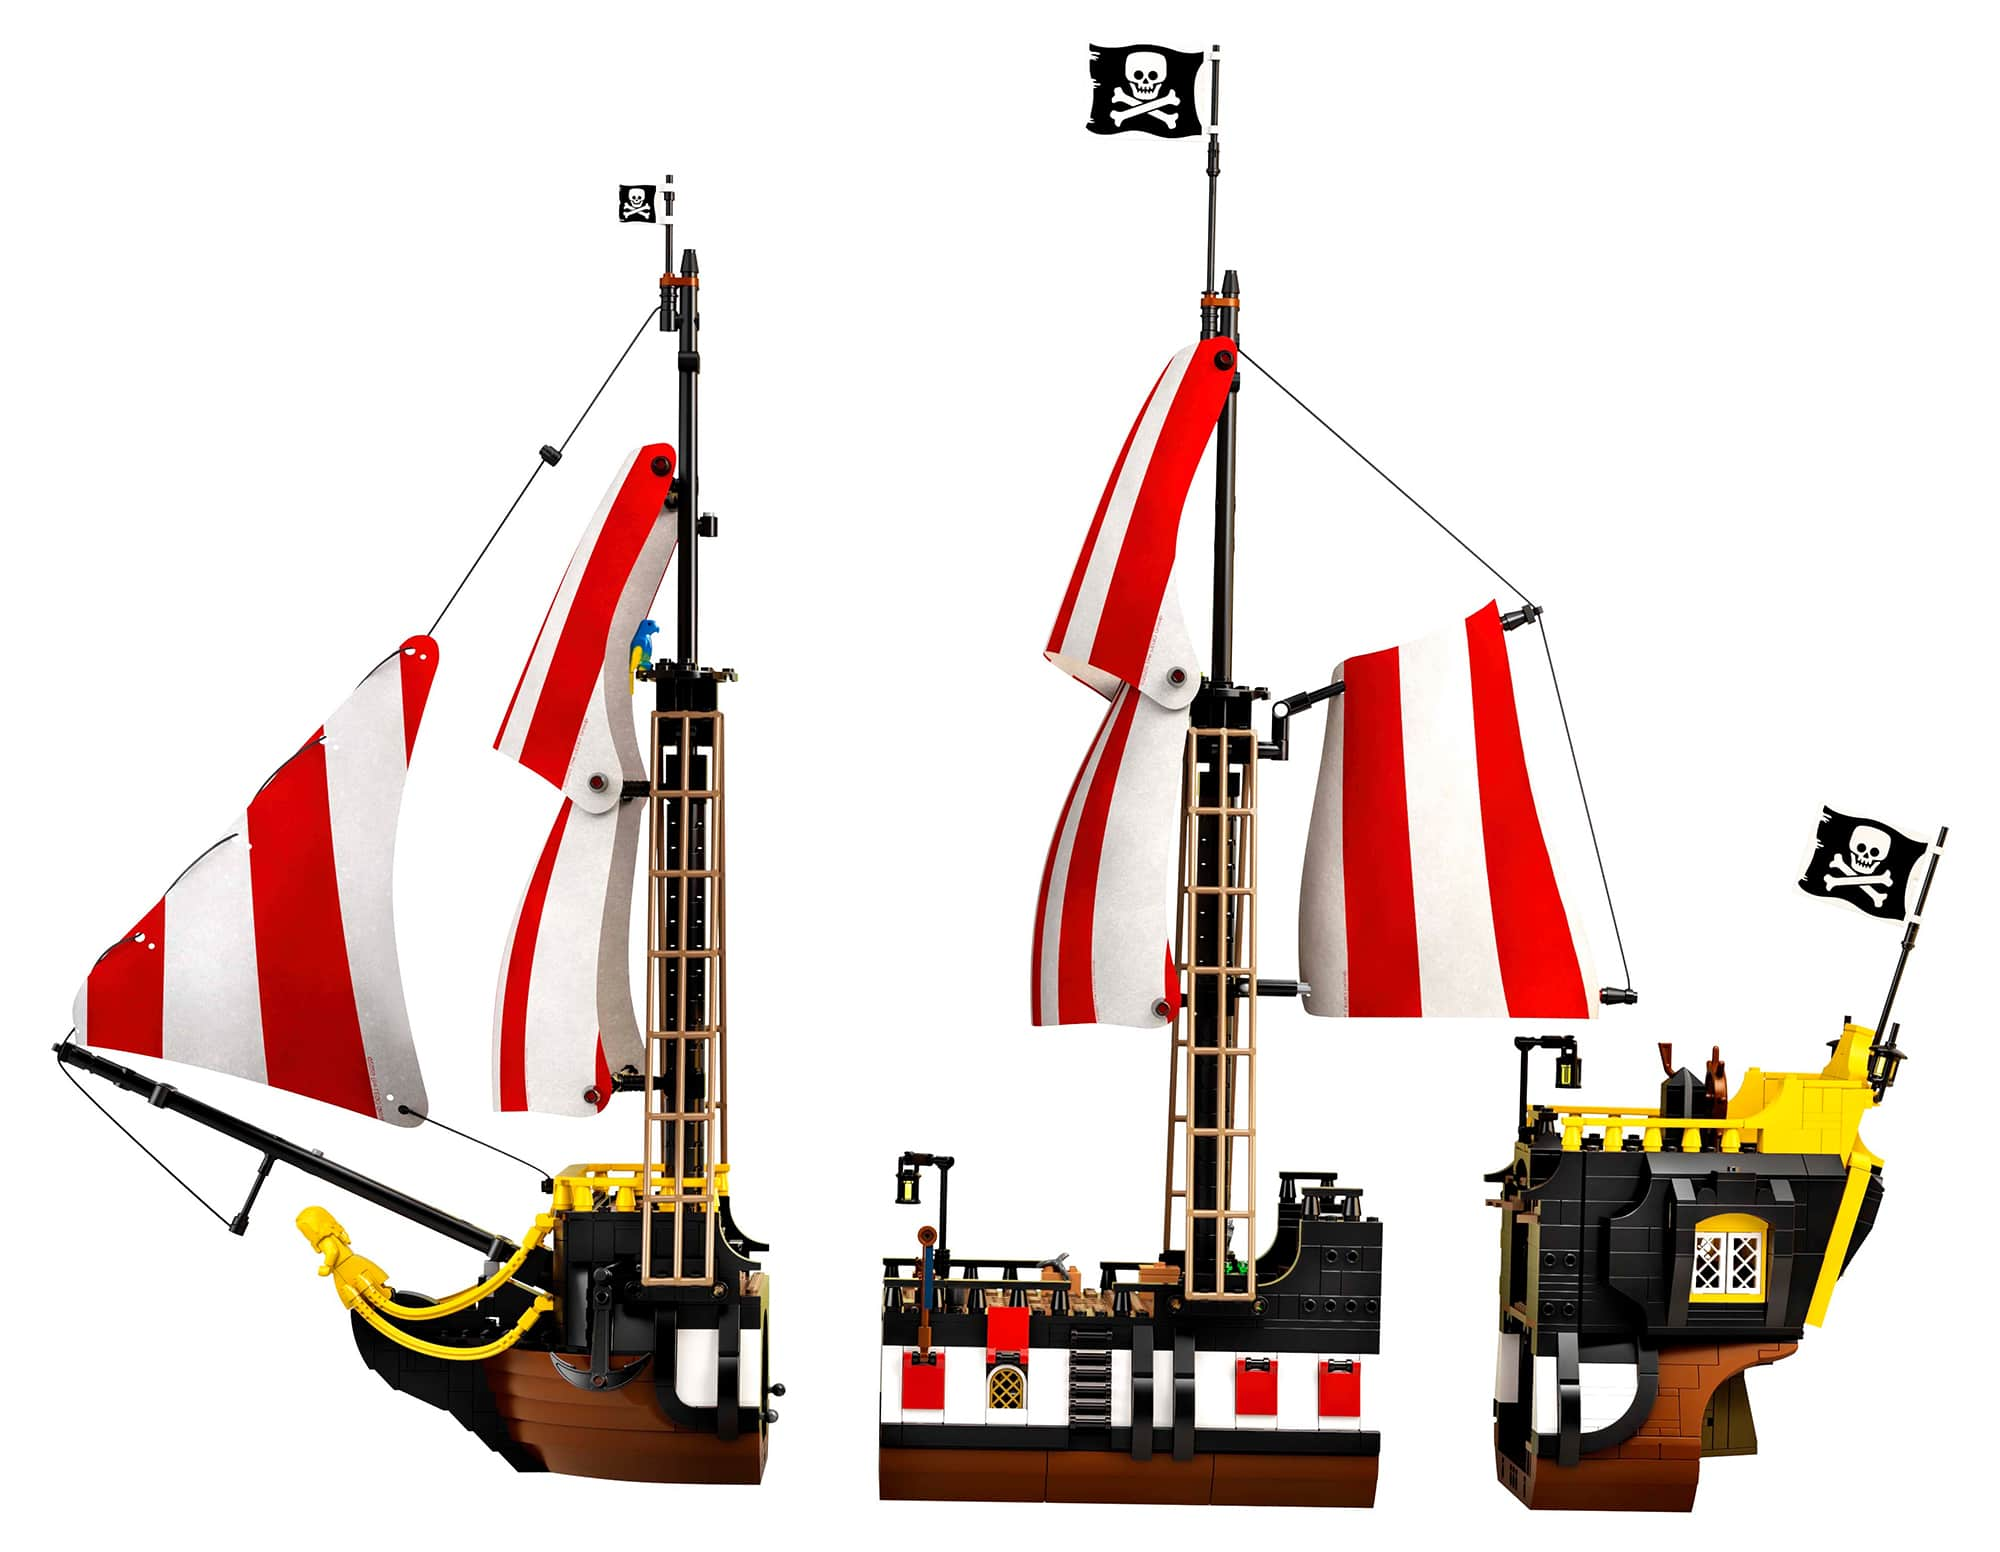 LEGO 21322 Einzelteile der Black Seas Barracuda